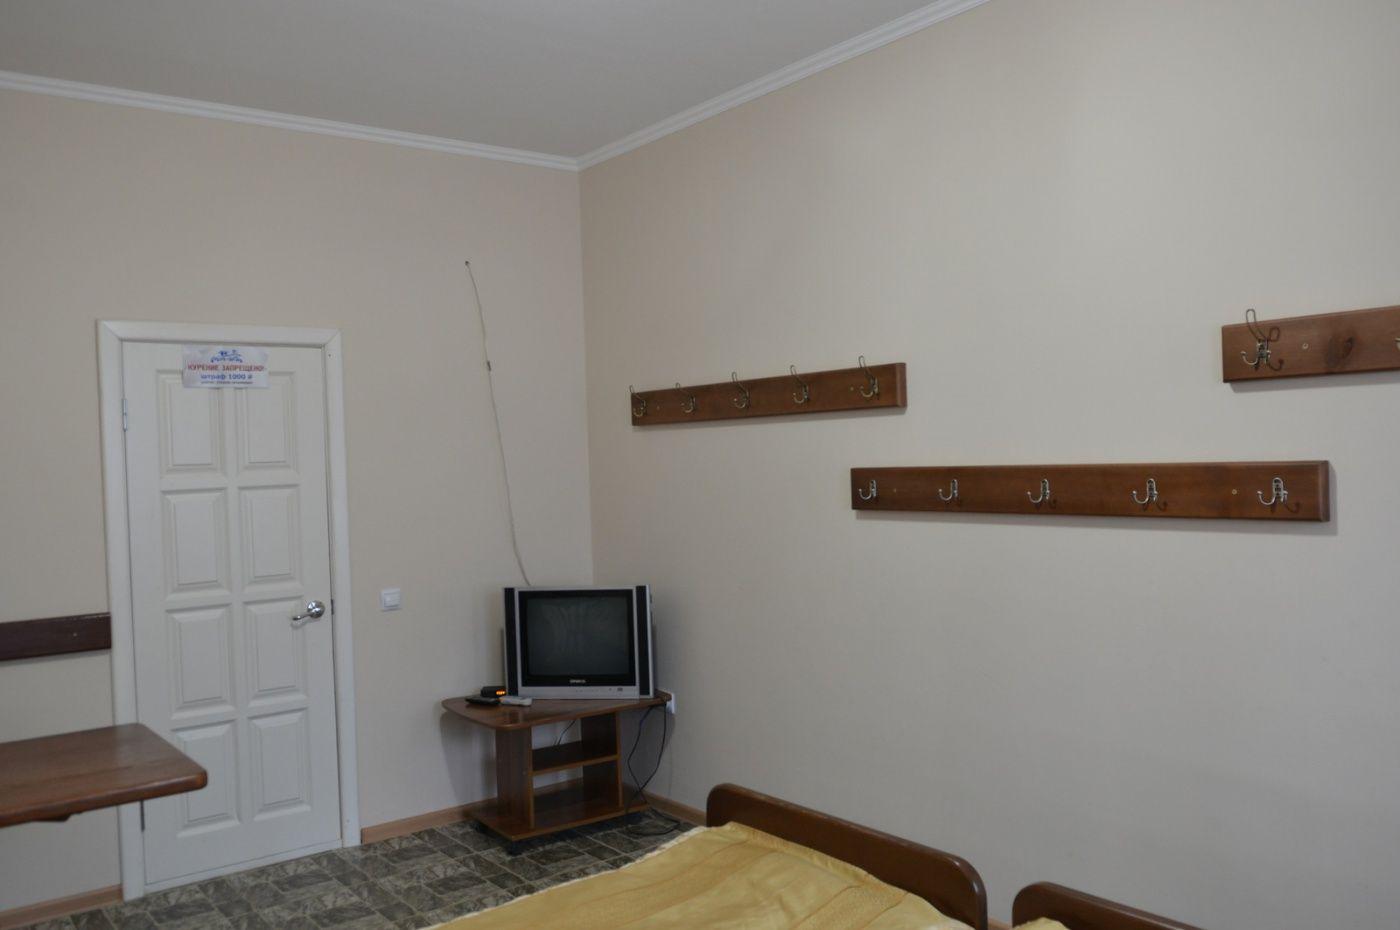 "База отдыха ""Аква-Вита"" Краснодарский край 1-комнатный номер ""эконом"", фото 5"